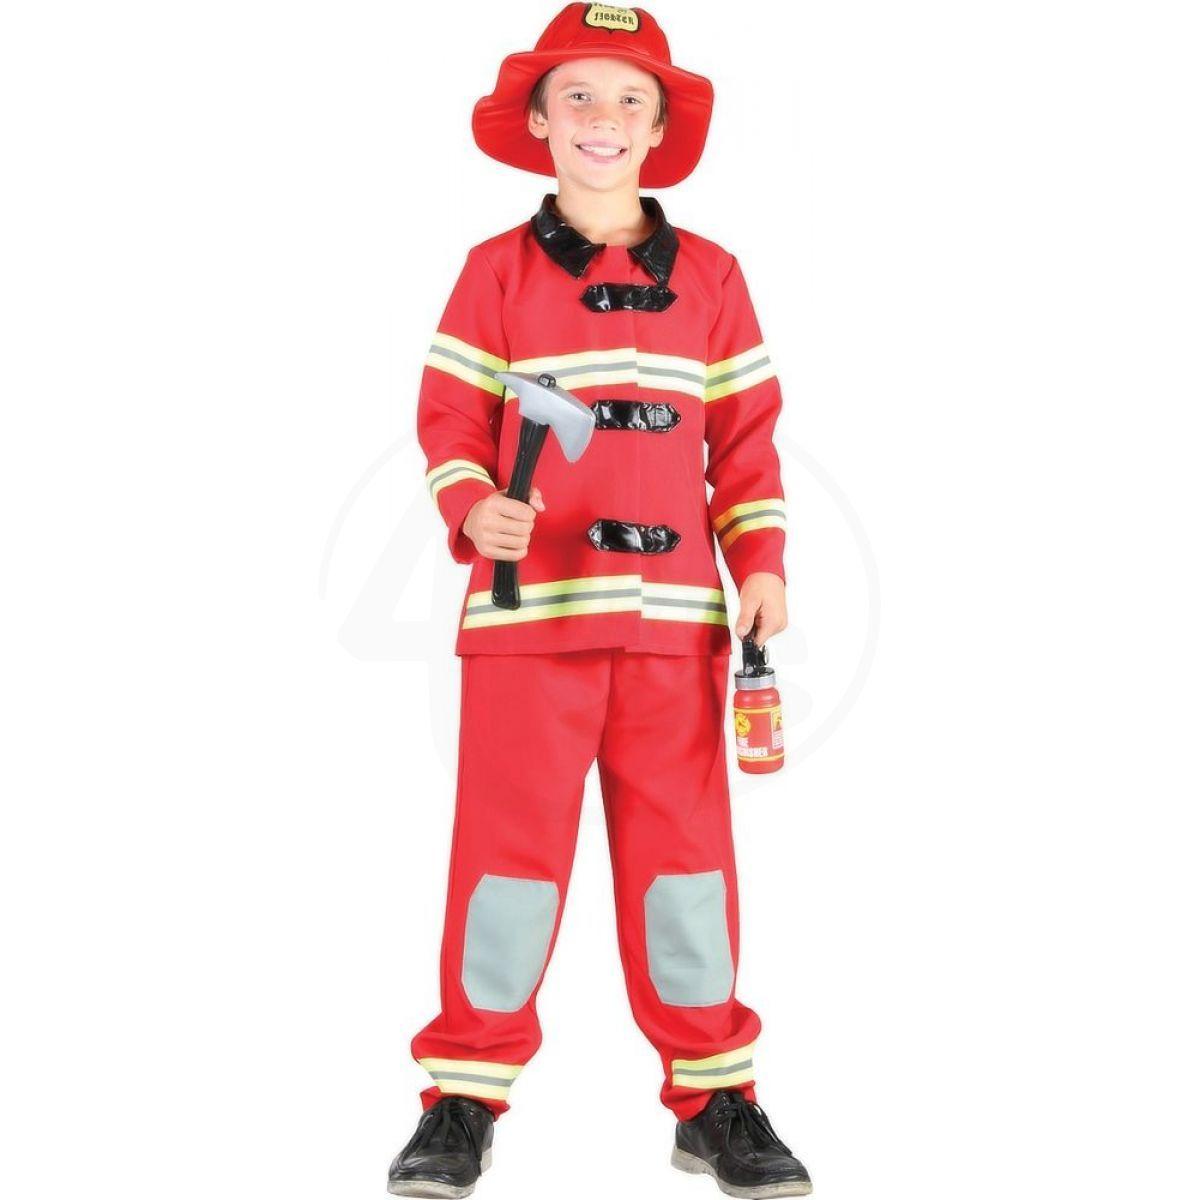 c95719daff46 Made kostym policie 120 130 cm levně